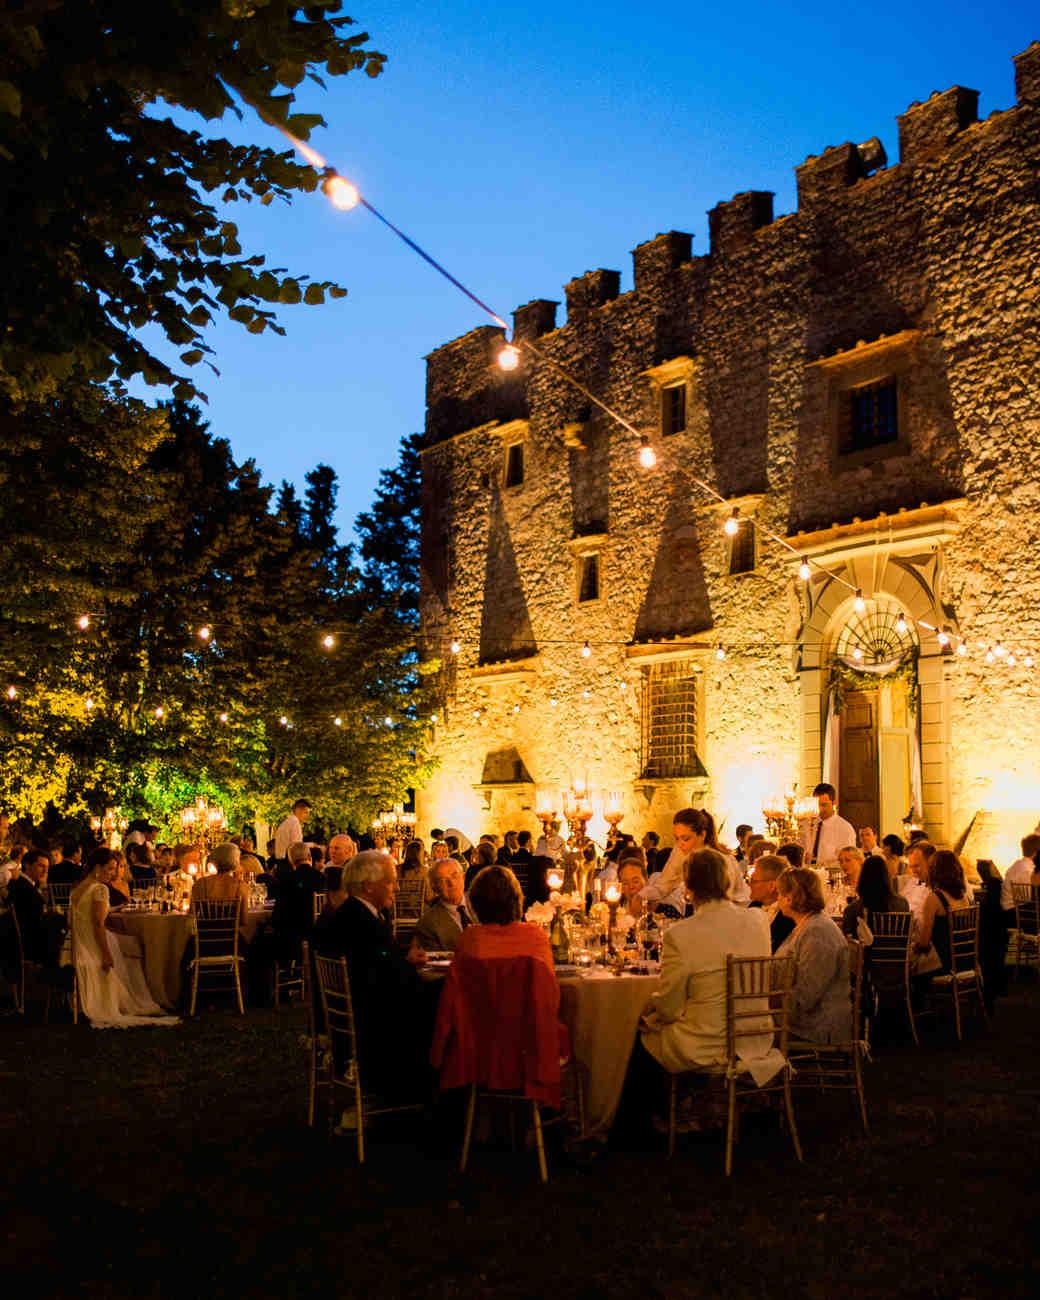 Outdoor wedding lighting - Outdoor Lighting For Wedding Reception